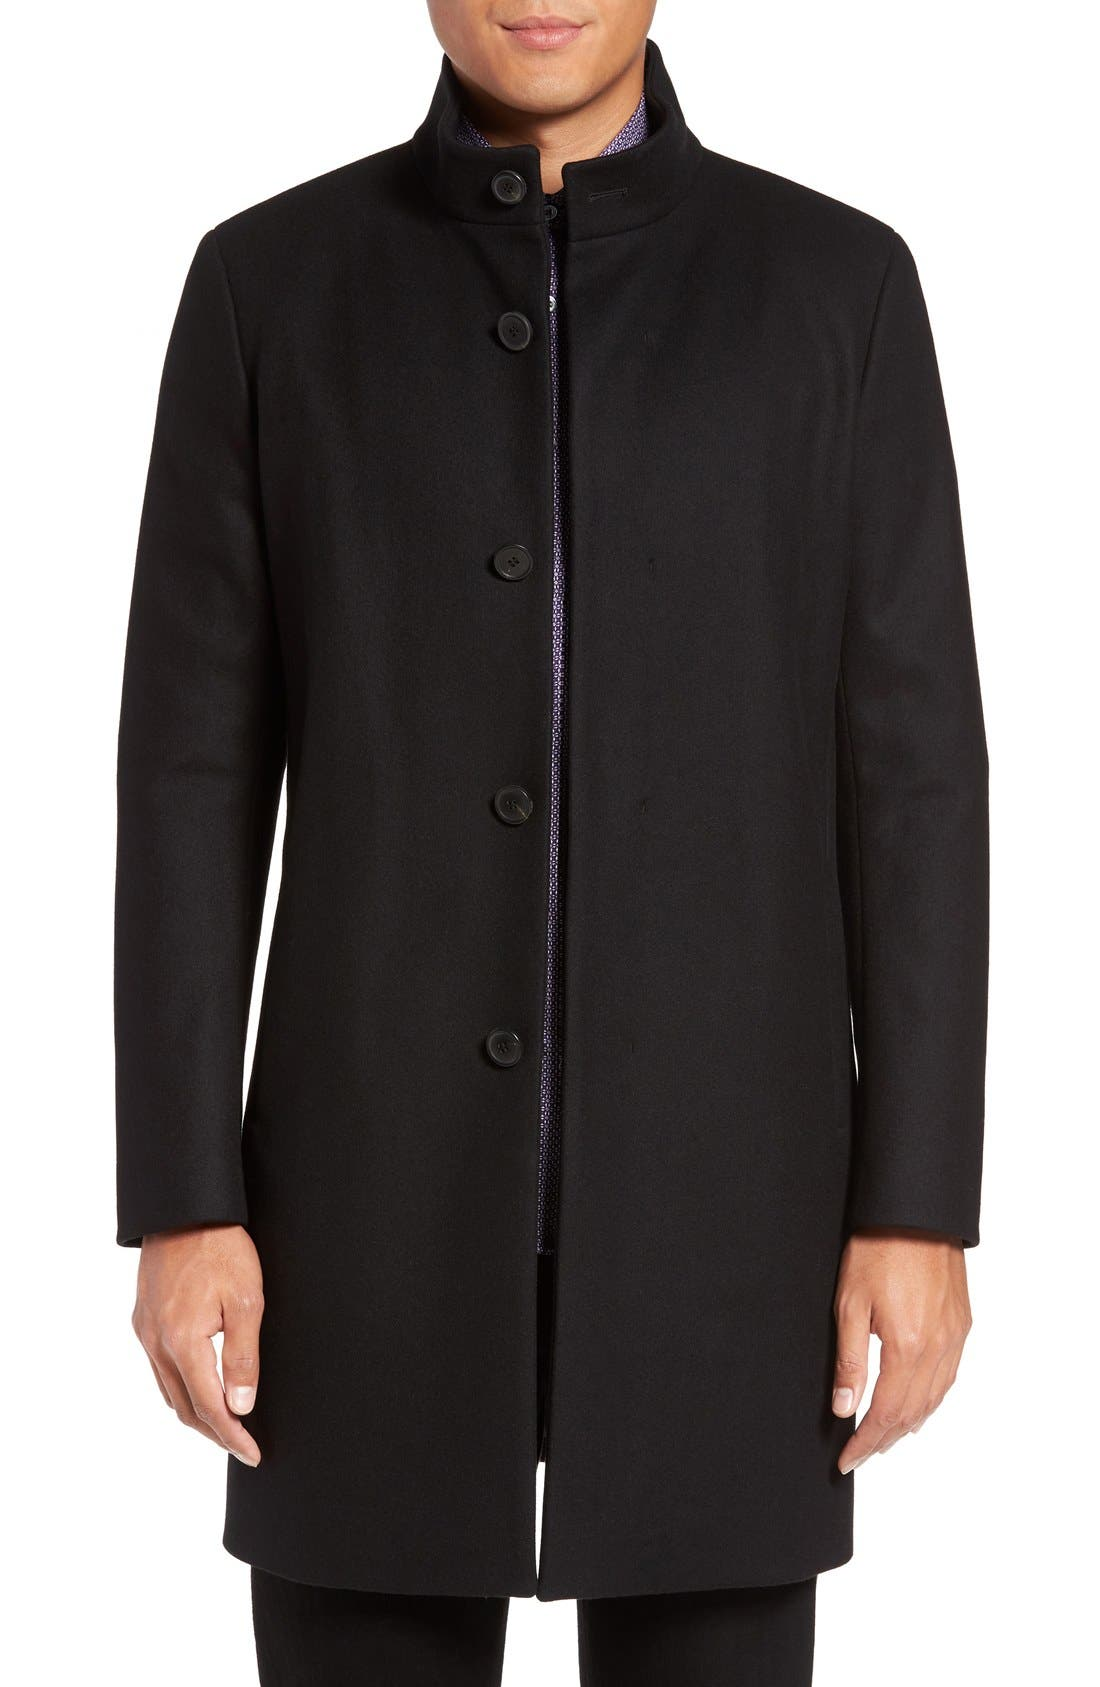 Alternate Image 1 Selected - Theory 'Belvin' Wool Blend Car Coat